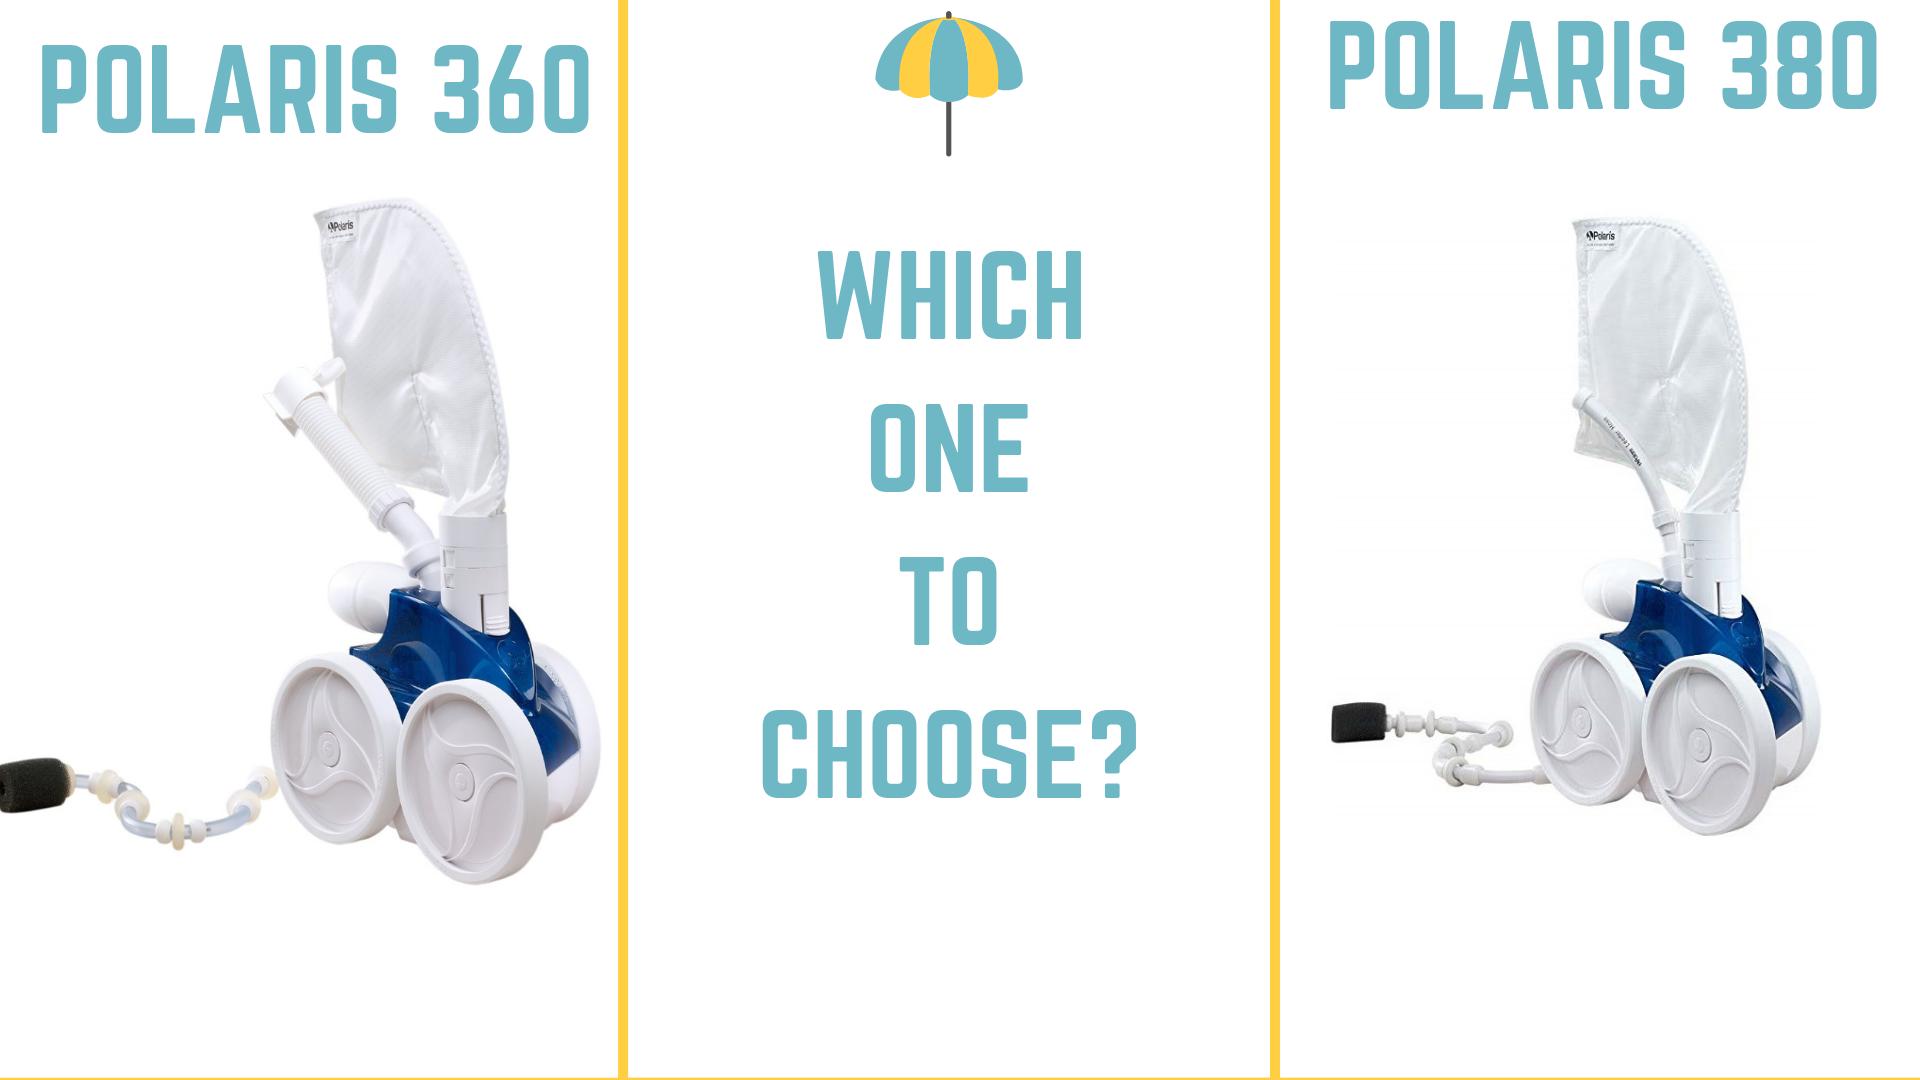 Polaris 360 vs Polaris 380